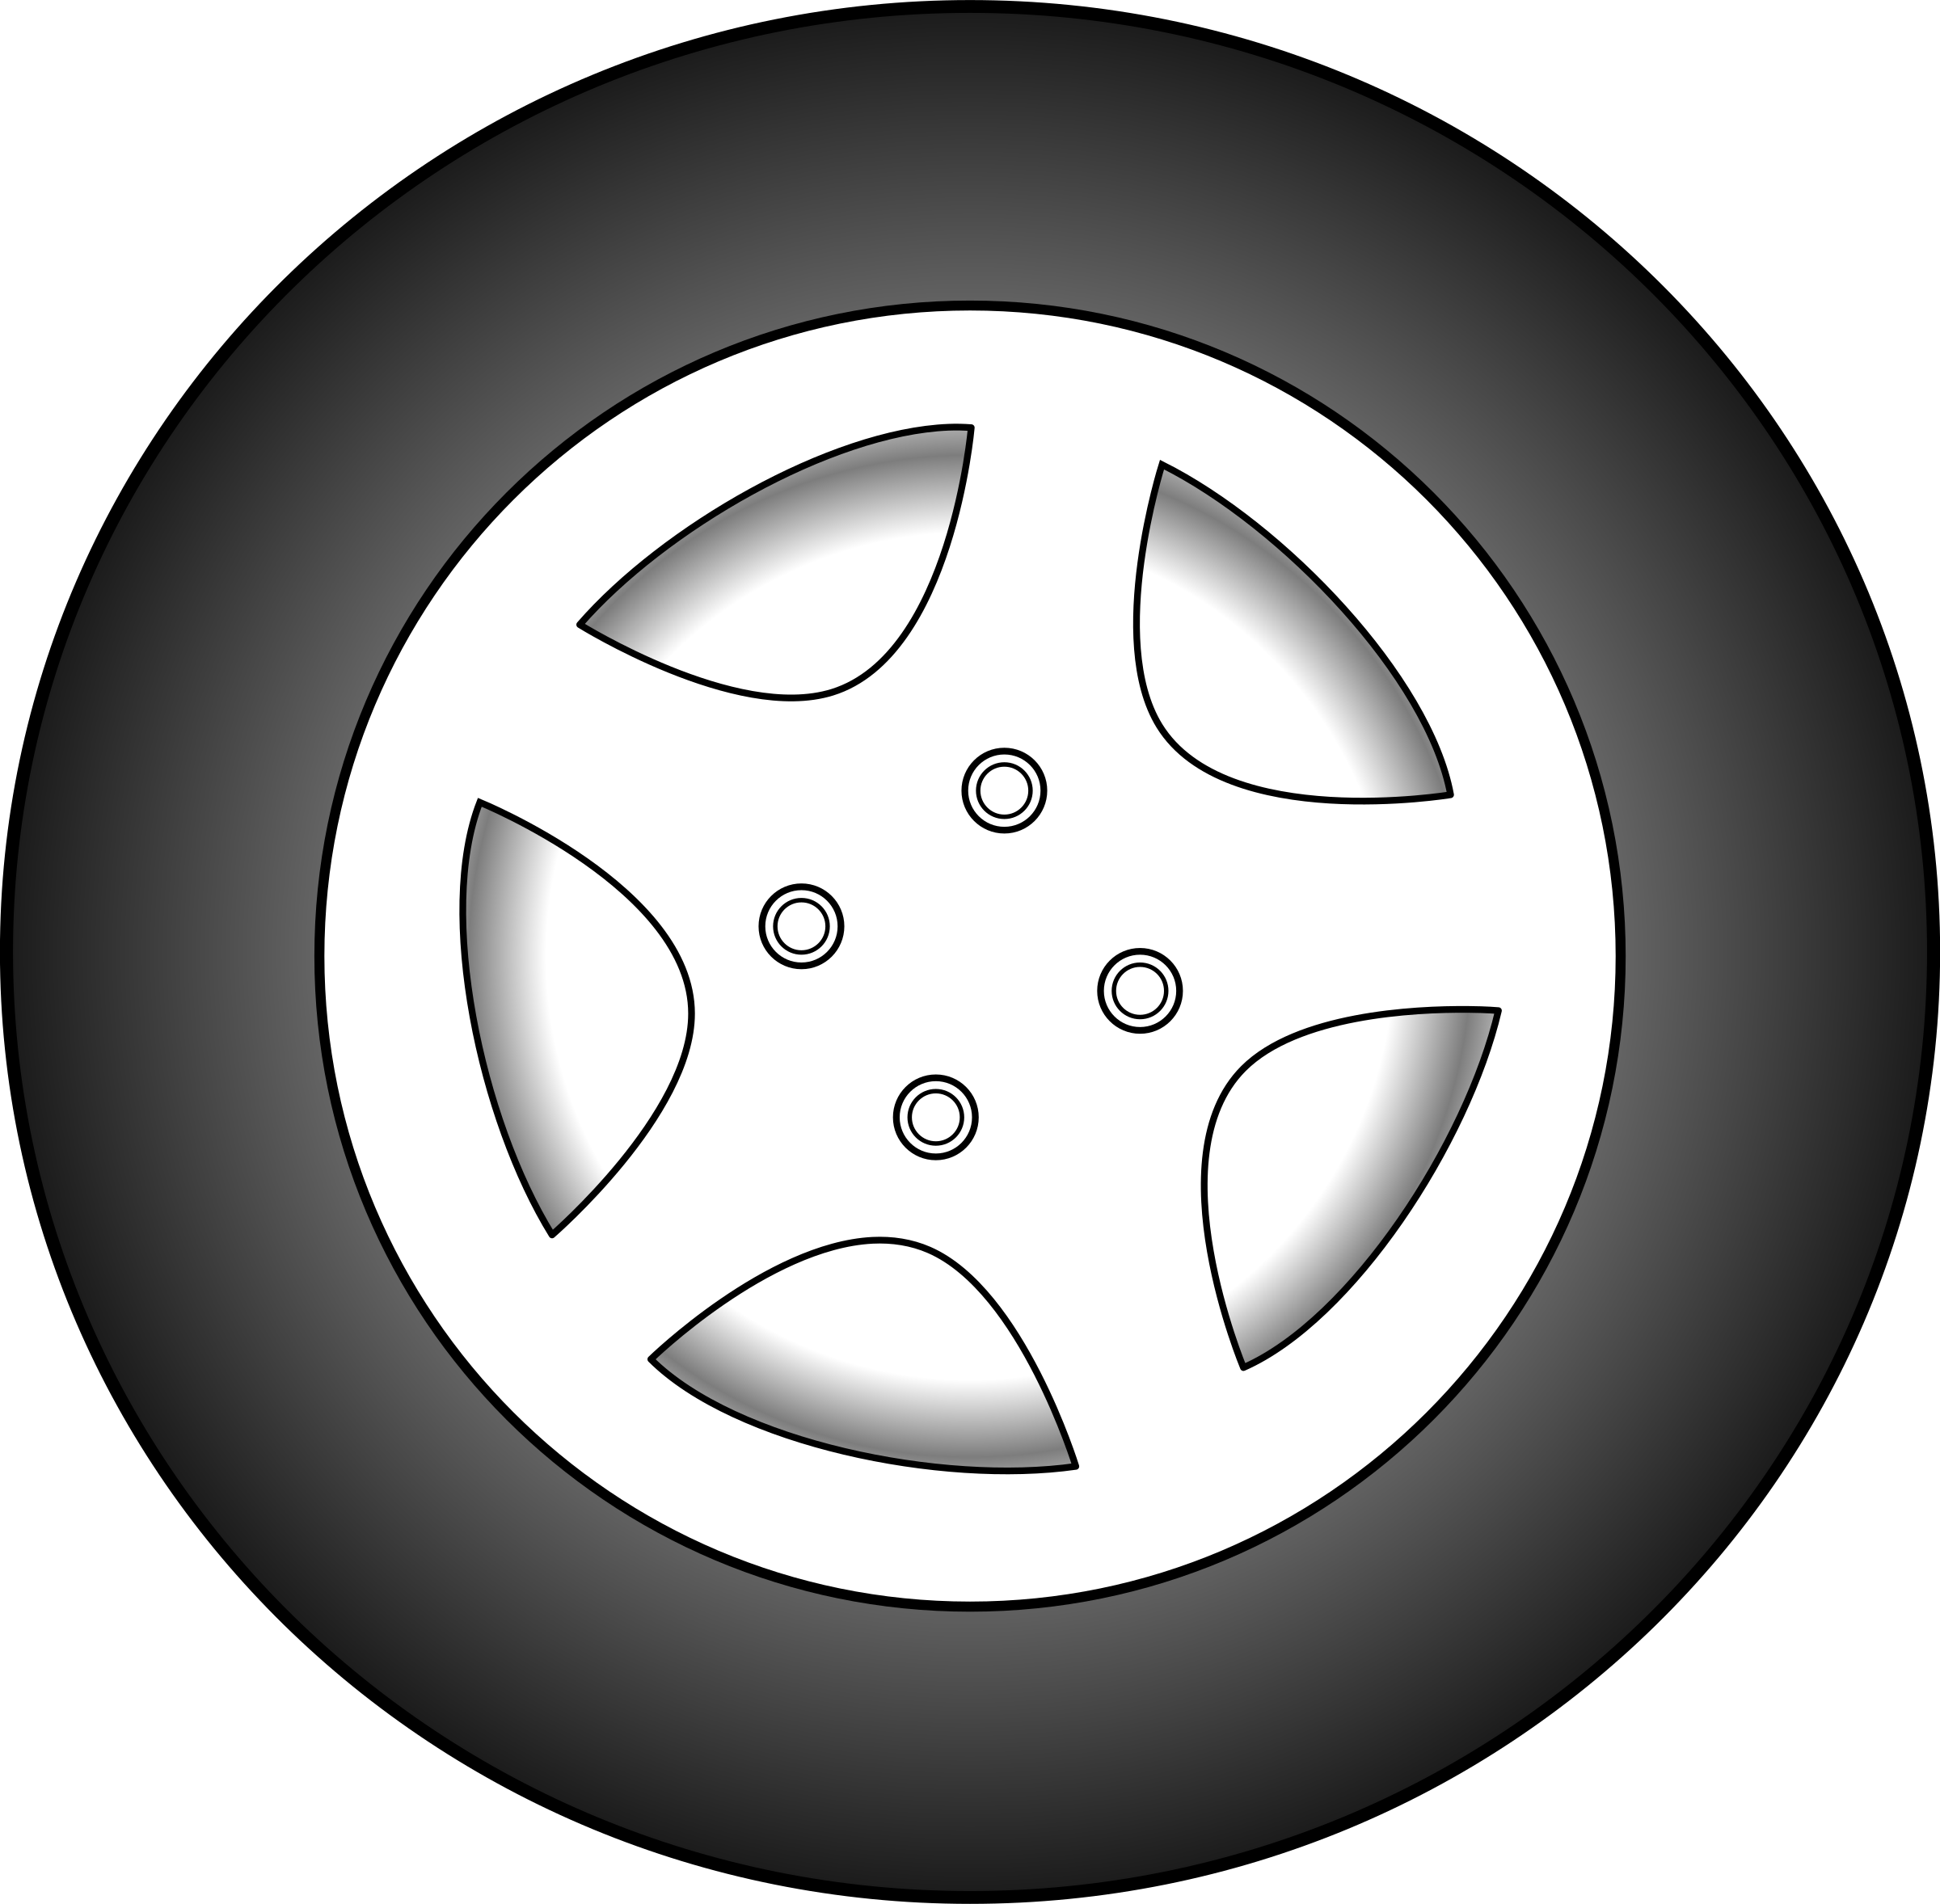 . Wheel clipart circle thing